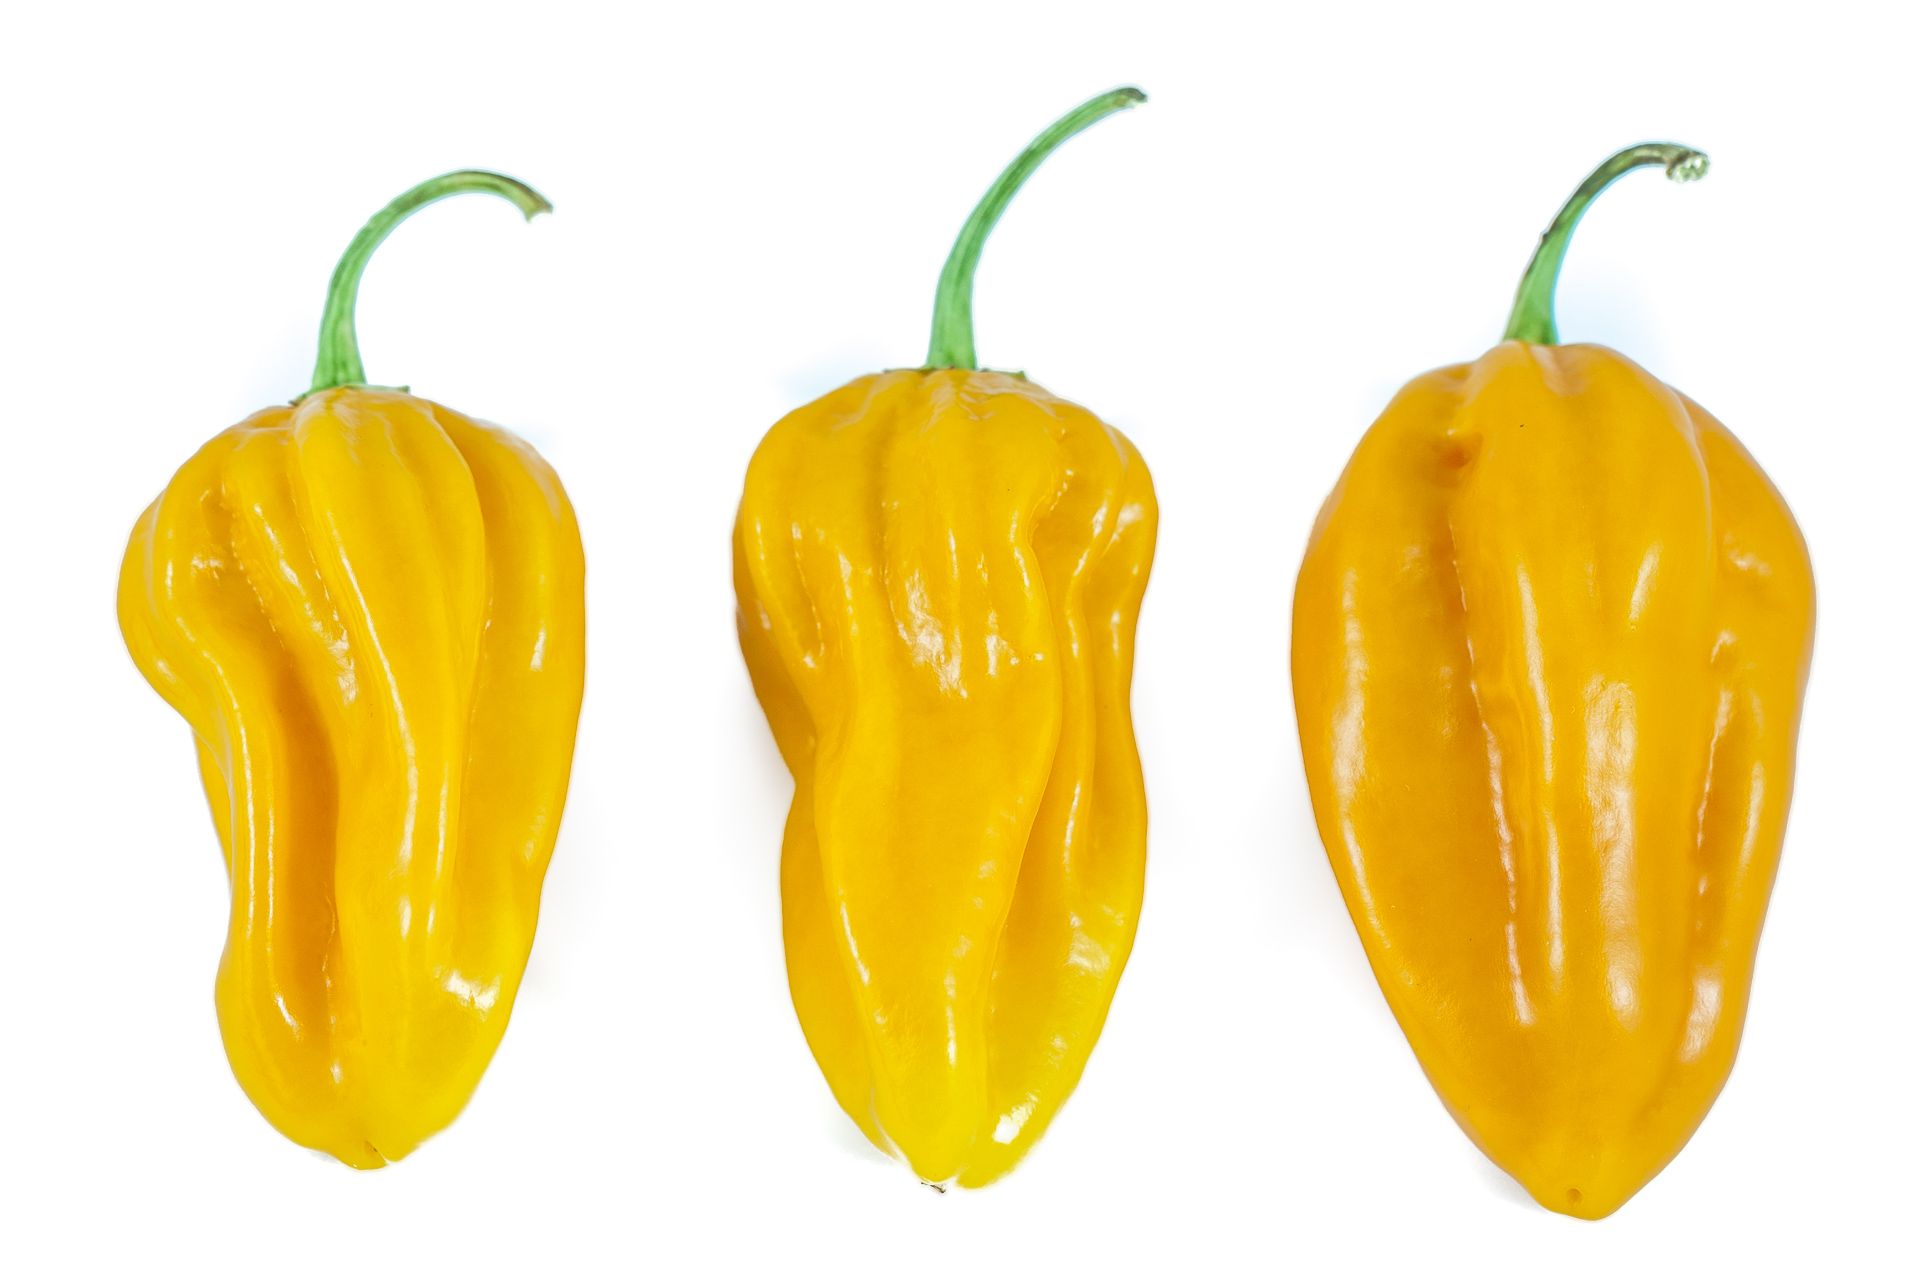 A44750196 - Capsicum chacoense - Chilisorte